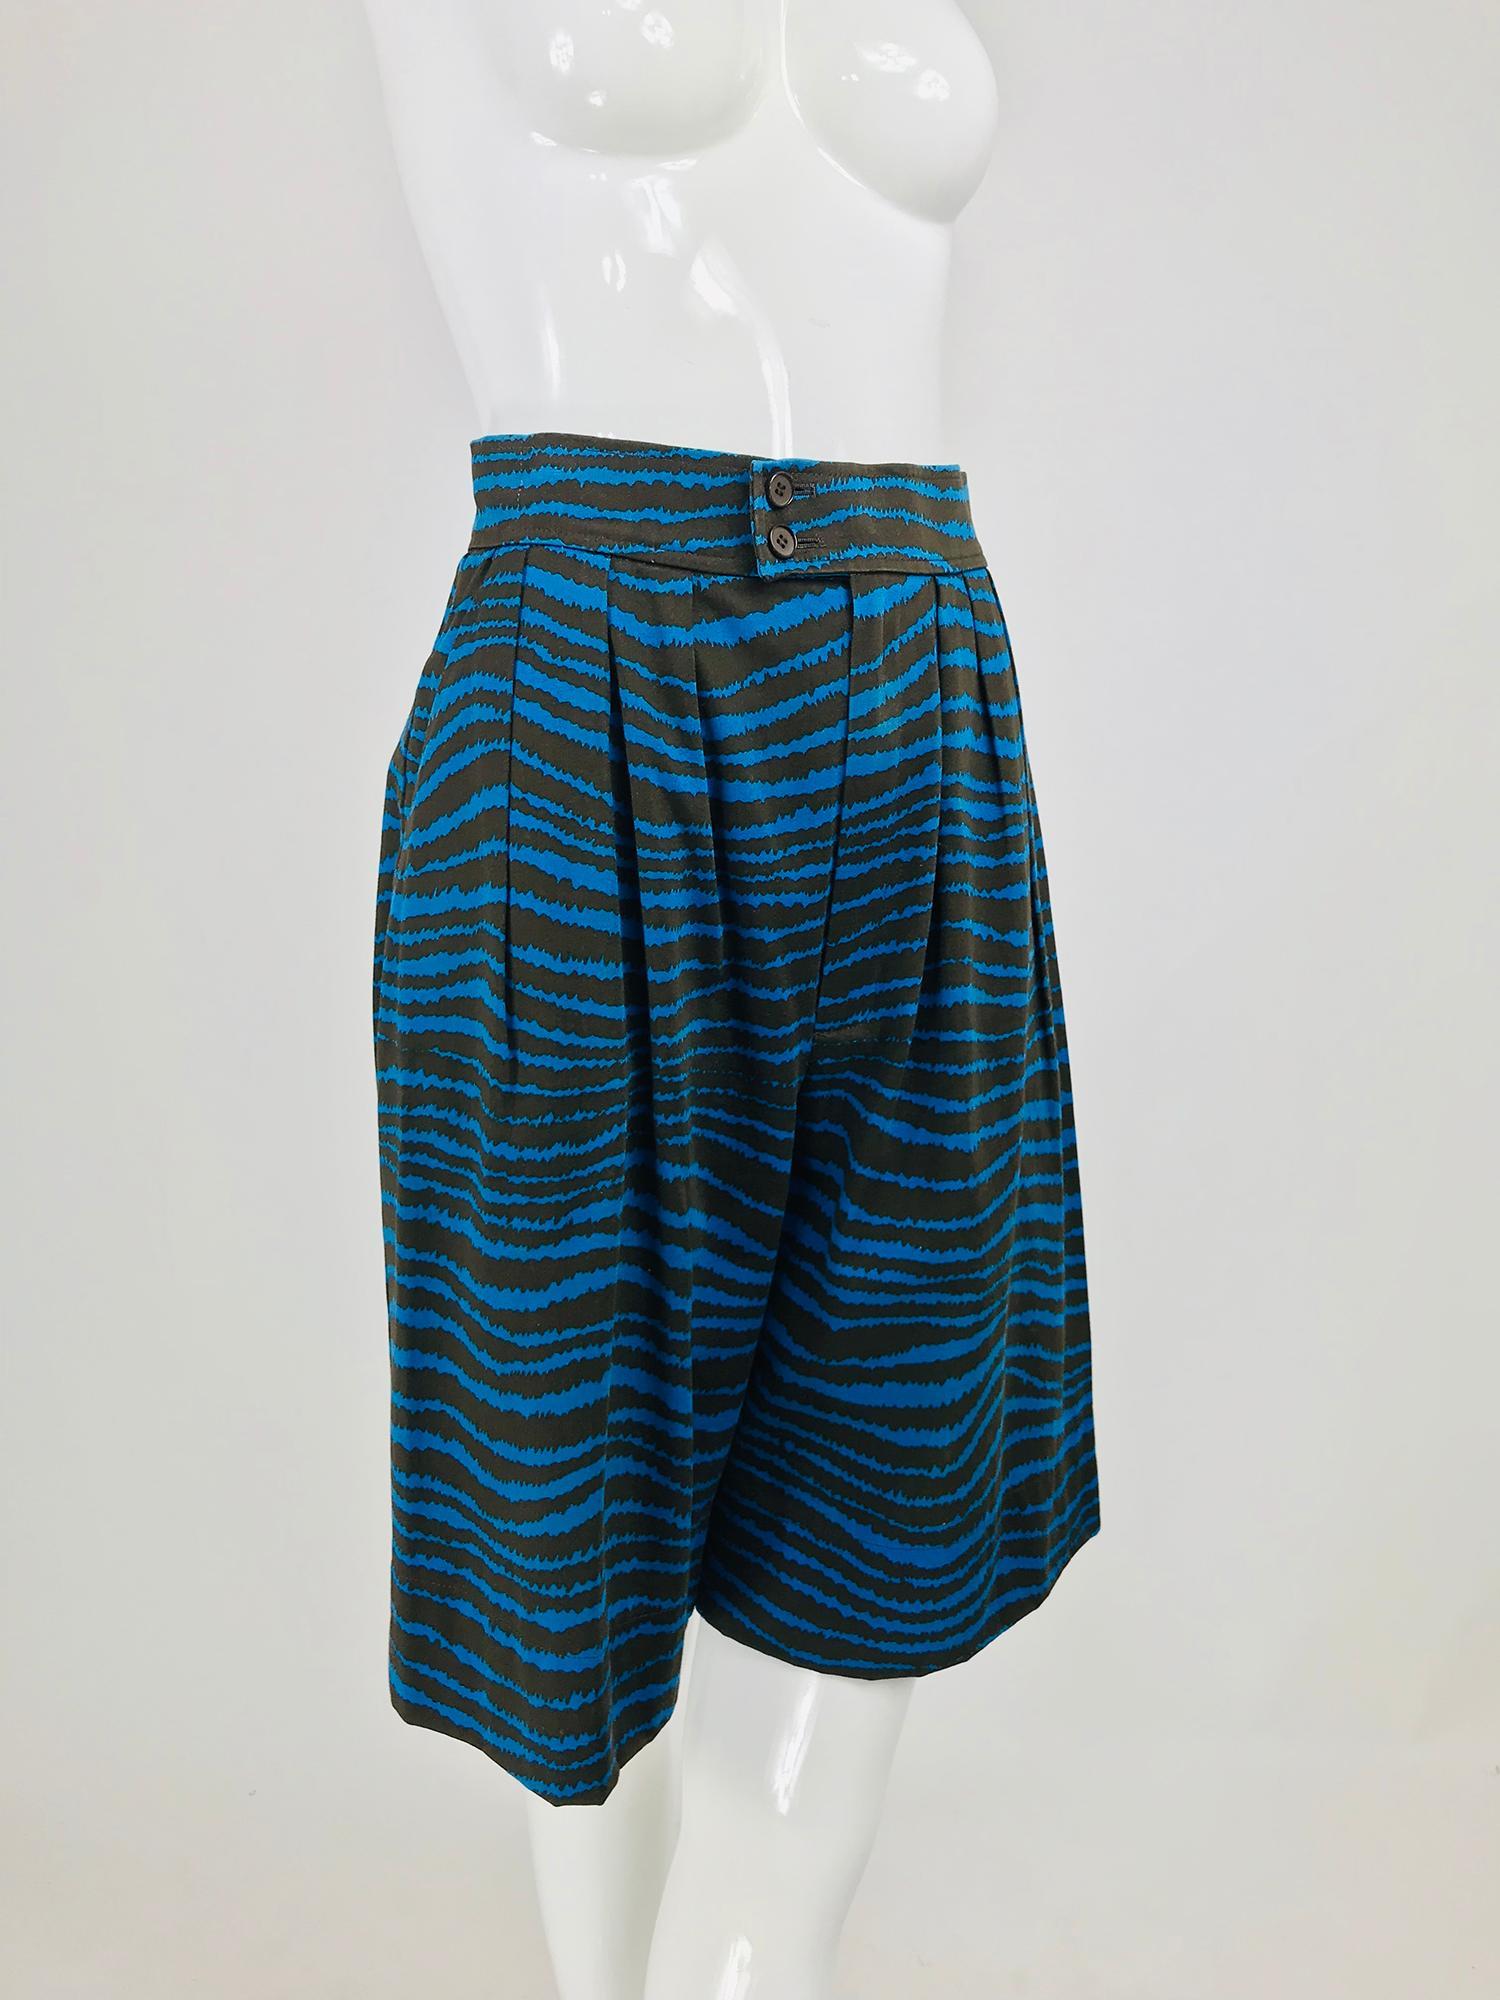 8b17bf302b5 Yves Saint Laurent tiger stripe blue and brown high waist full leg shorts  1980s For Sale at 1stdibs